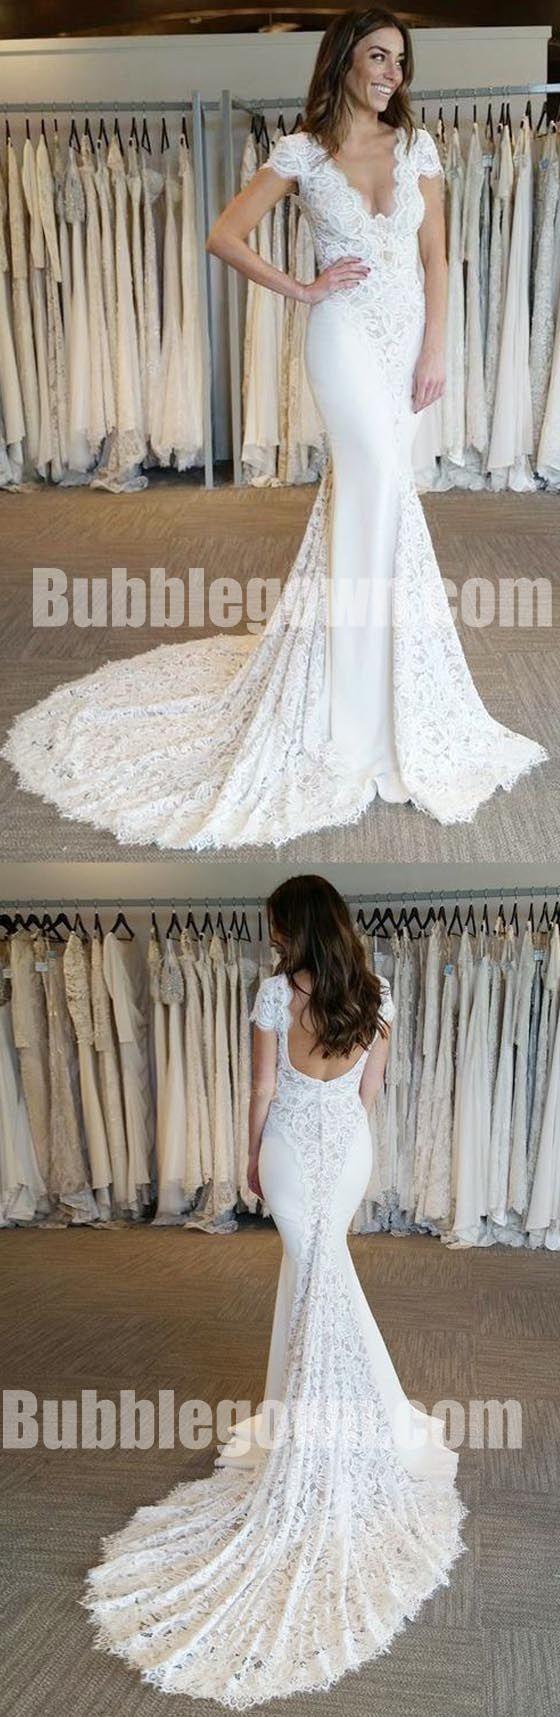 Cap sleeves v neck lace mermaid elegant long wedding dresses bgw